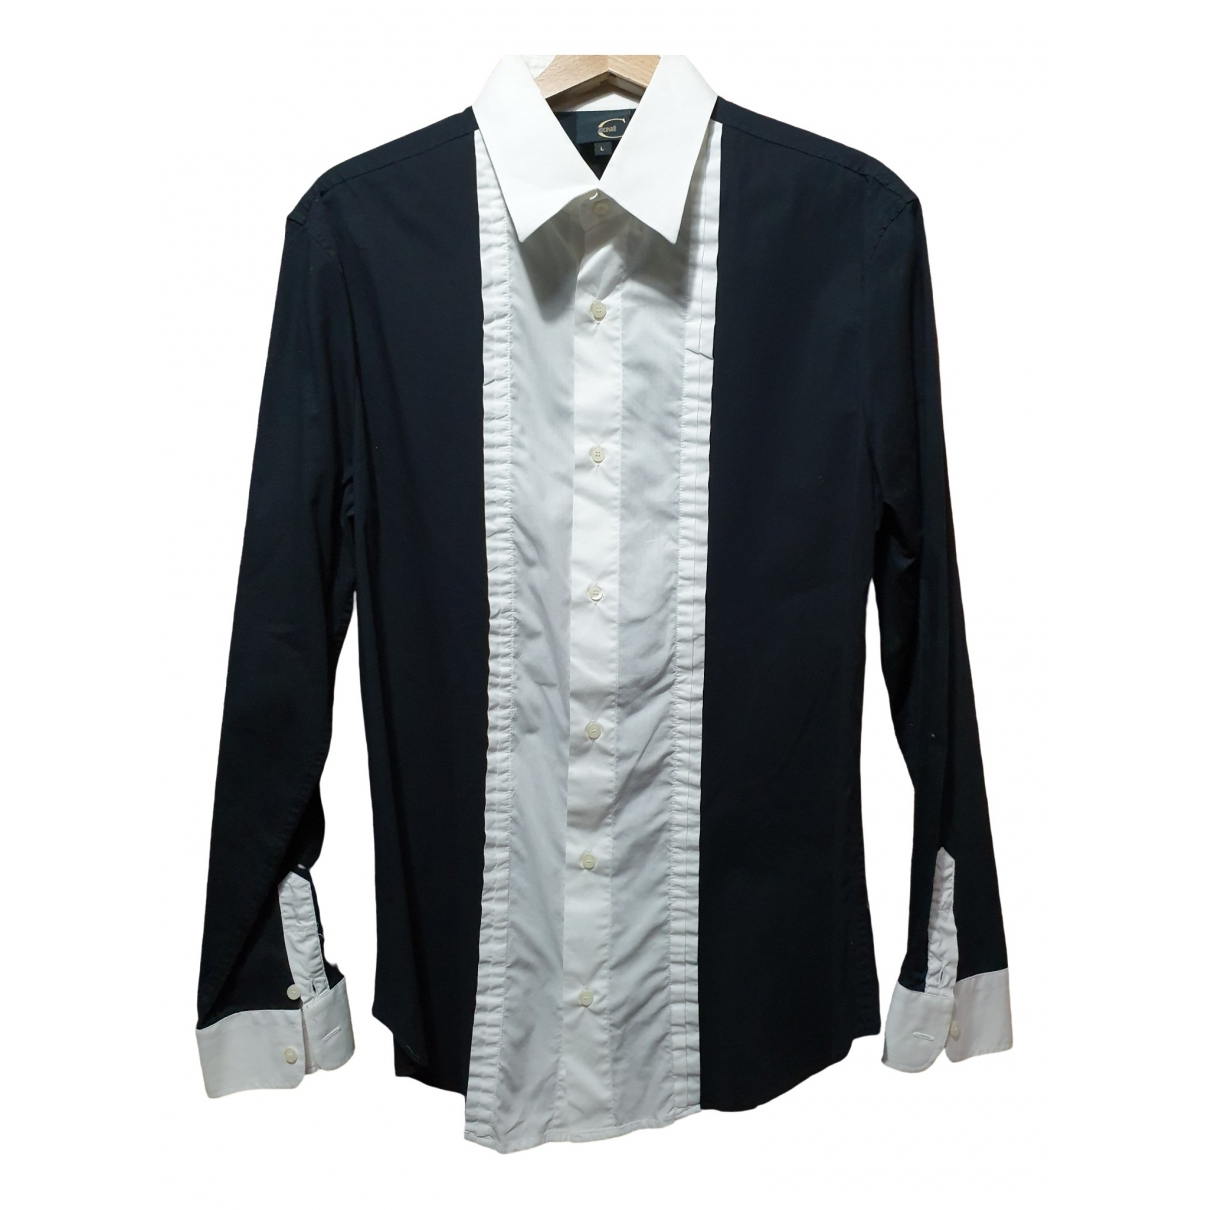 Just Cavalli \N Black Shirts for Men L International